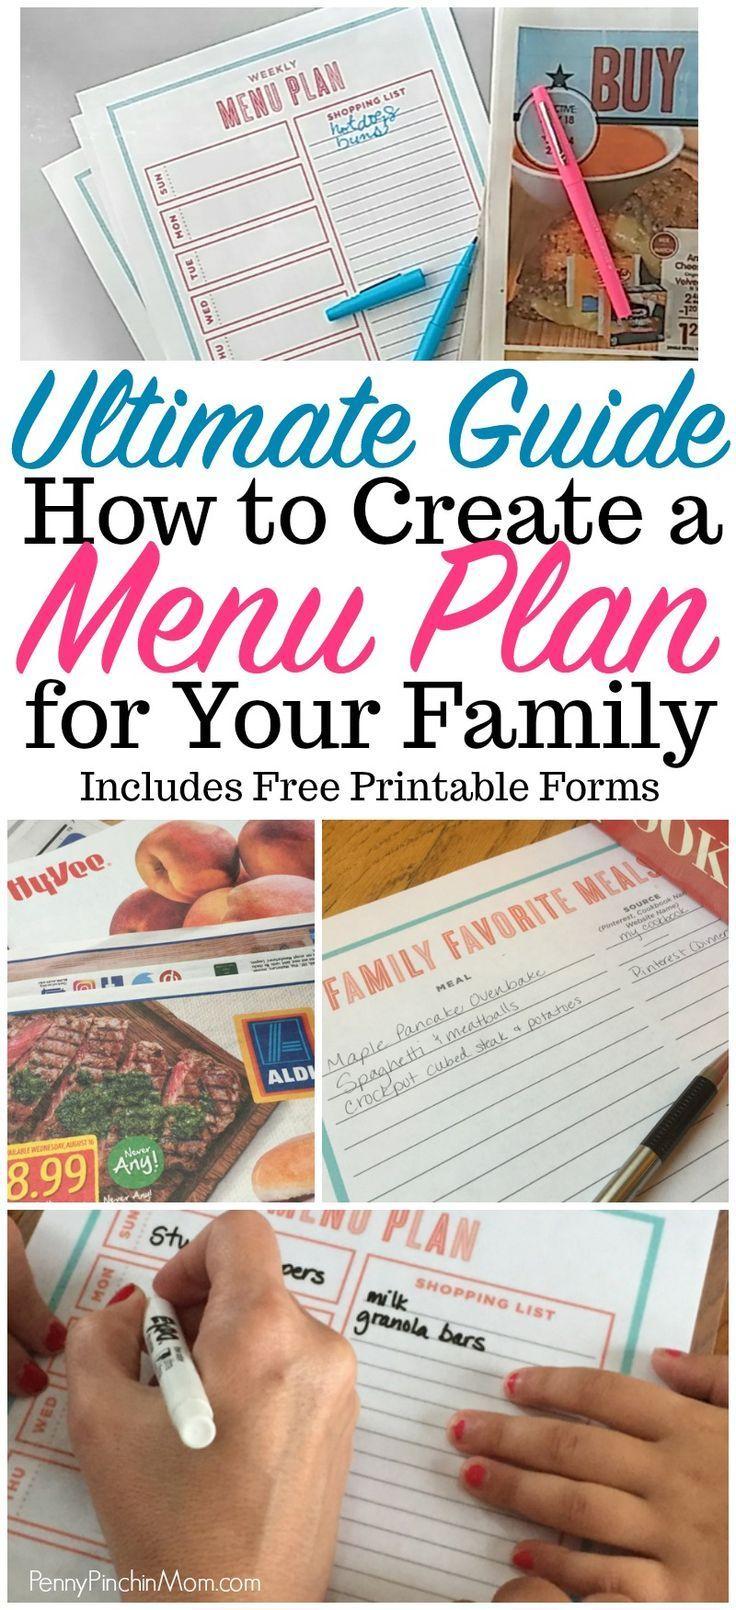 how to create a menu plan for your family  Menu planning forms | help menu planning | how to start with a menu plan